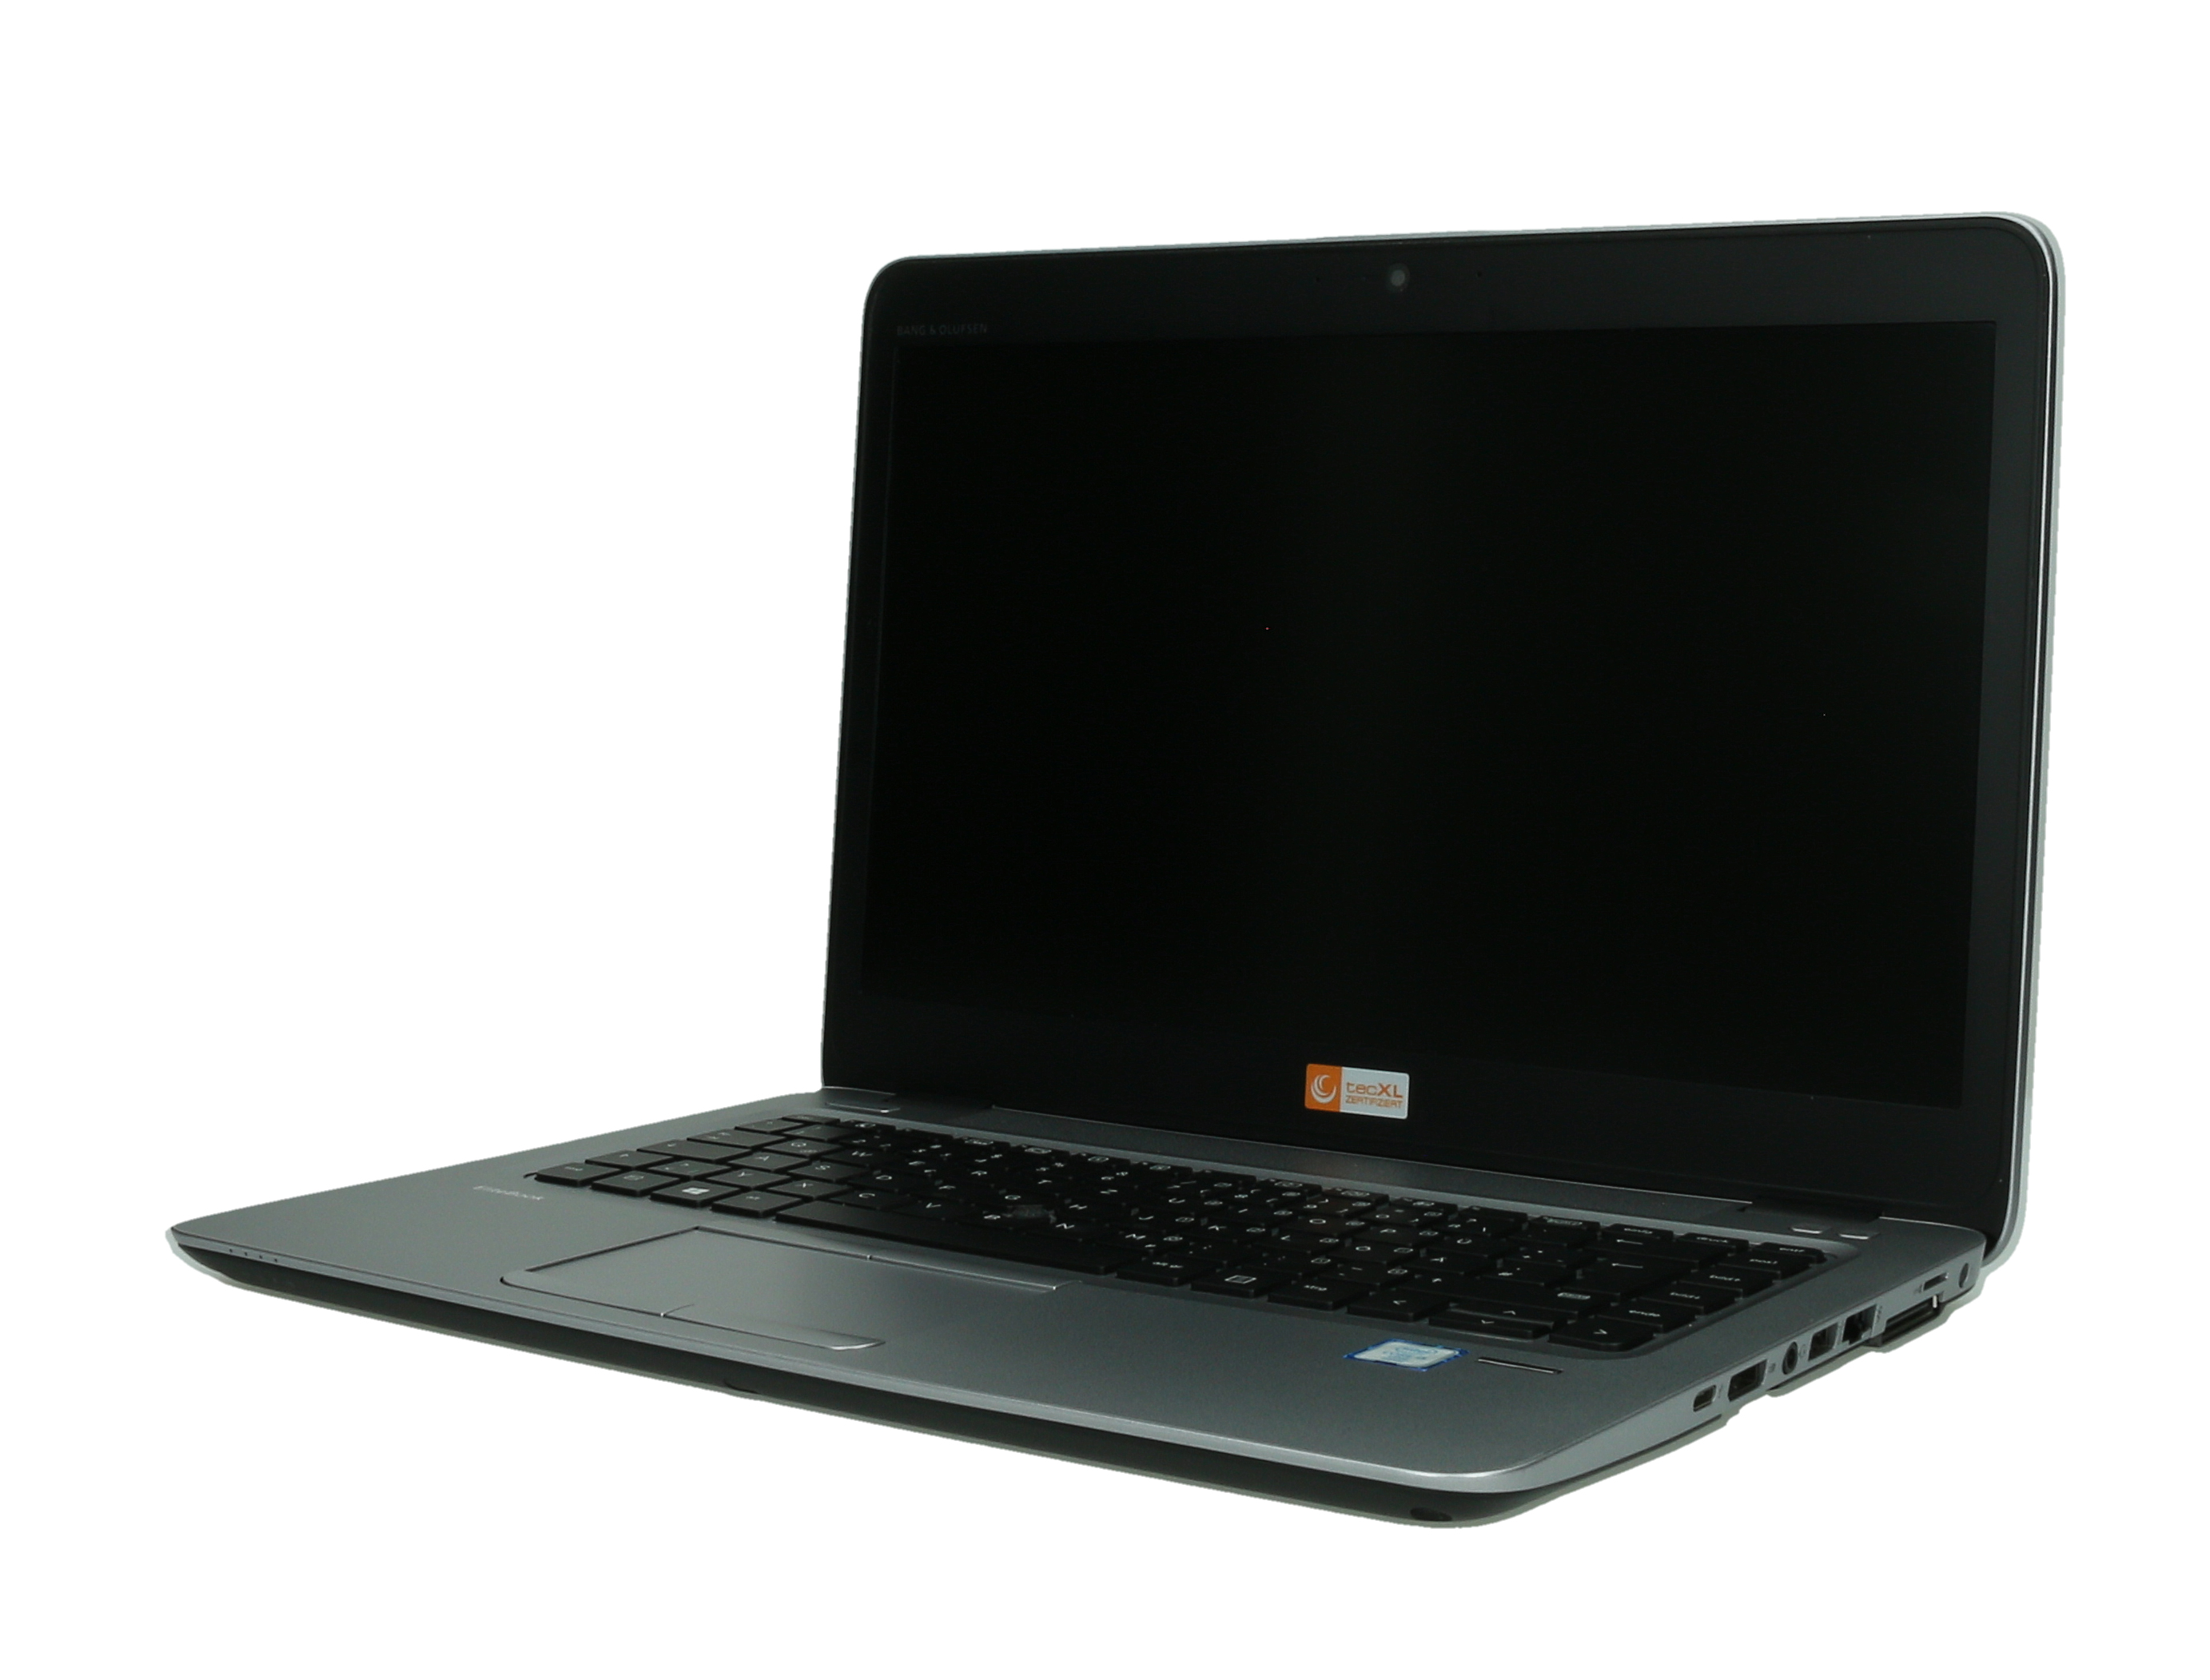 Hewlett Packard Elitebook 840 G3